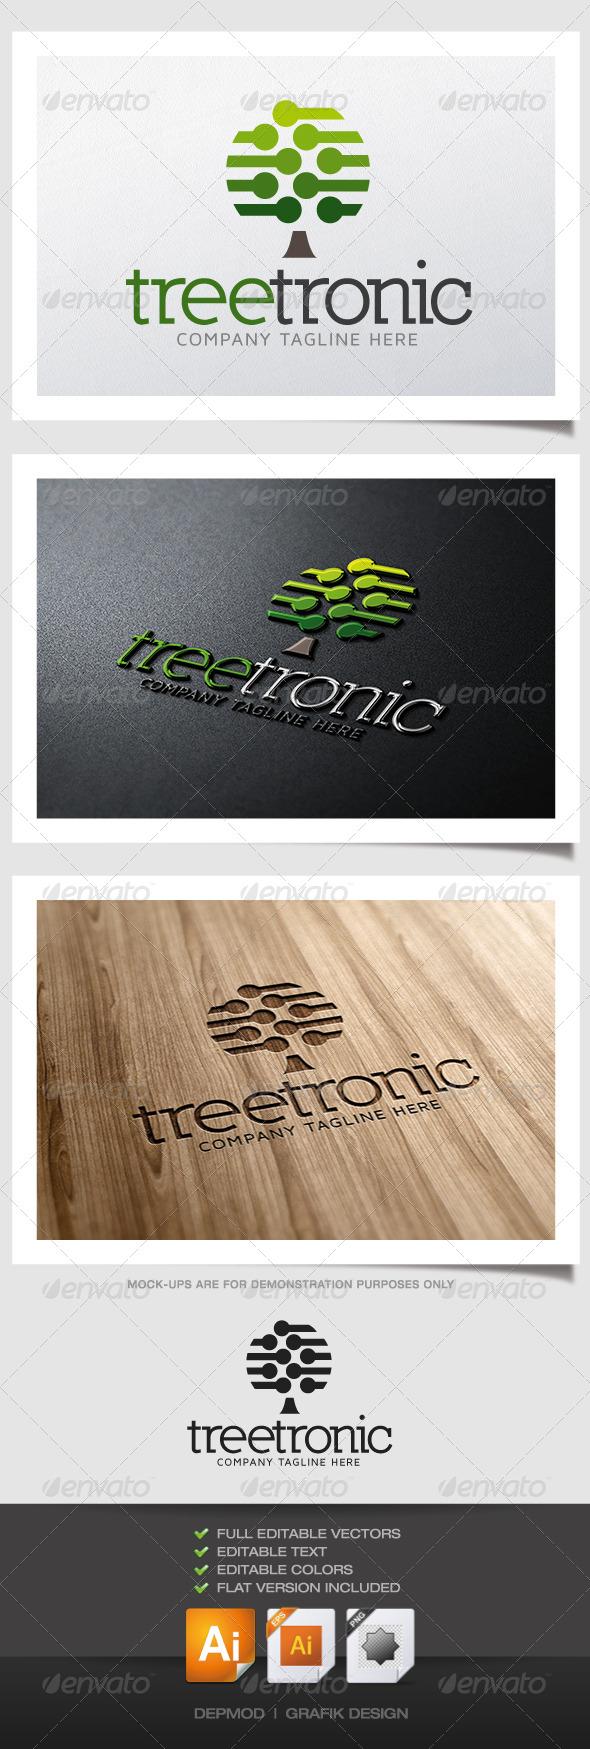 GraphicRiver Tree Tronic Logo 5001950